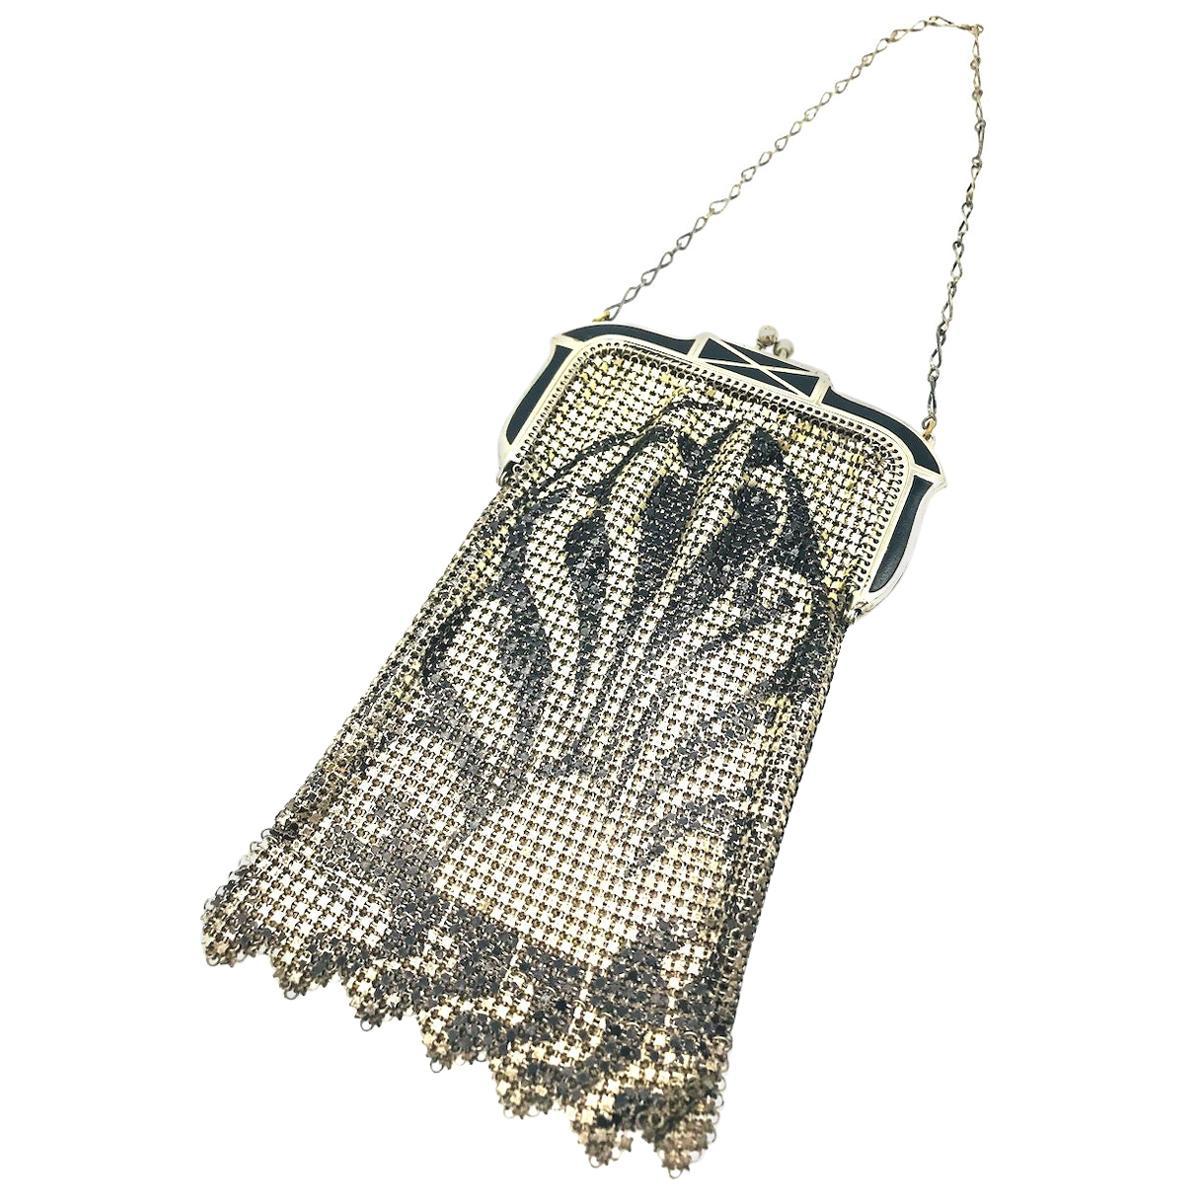 Art Deco Mesh Black Enameled Silver Pouch Purse Circa 1876